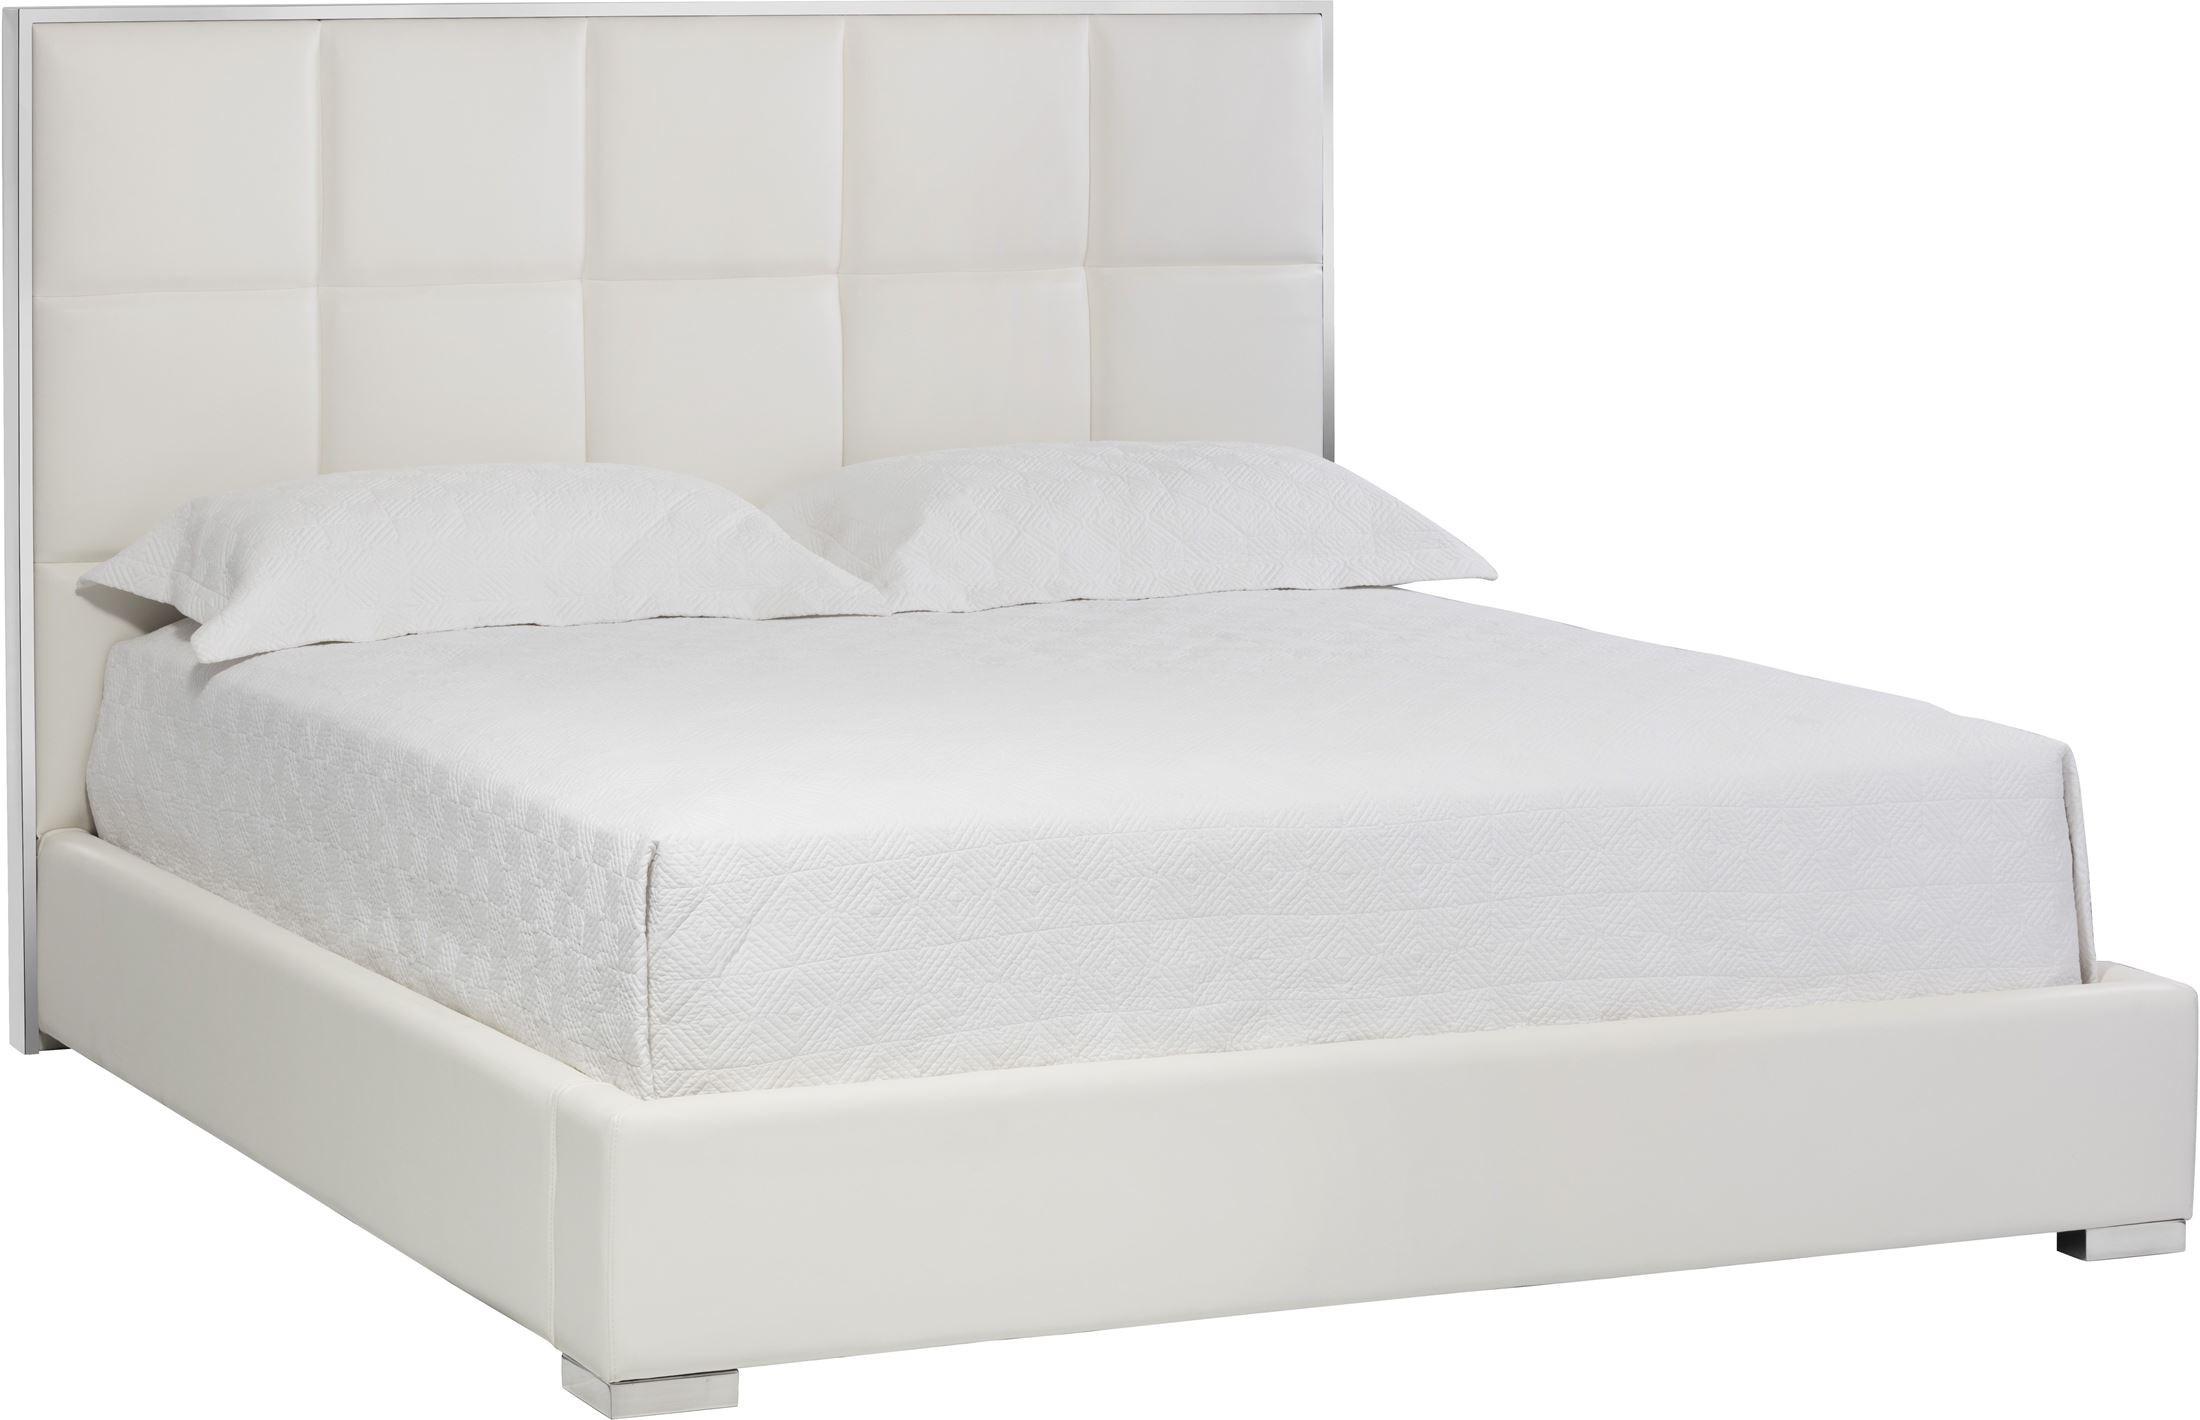 Tompkins White Leather King Platform Bed Sunpan